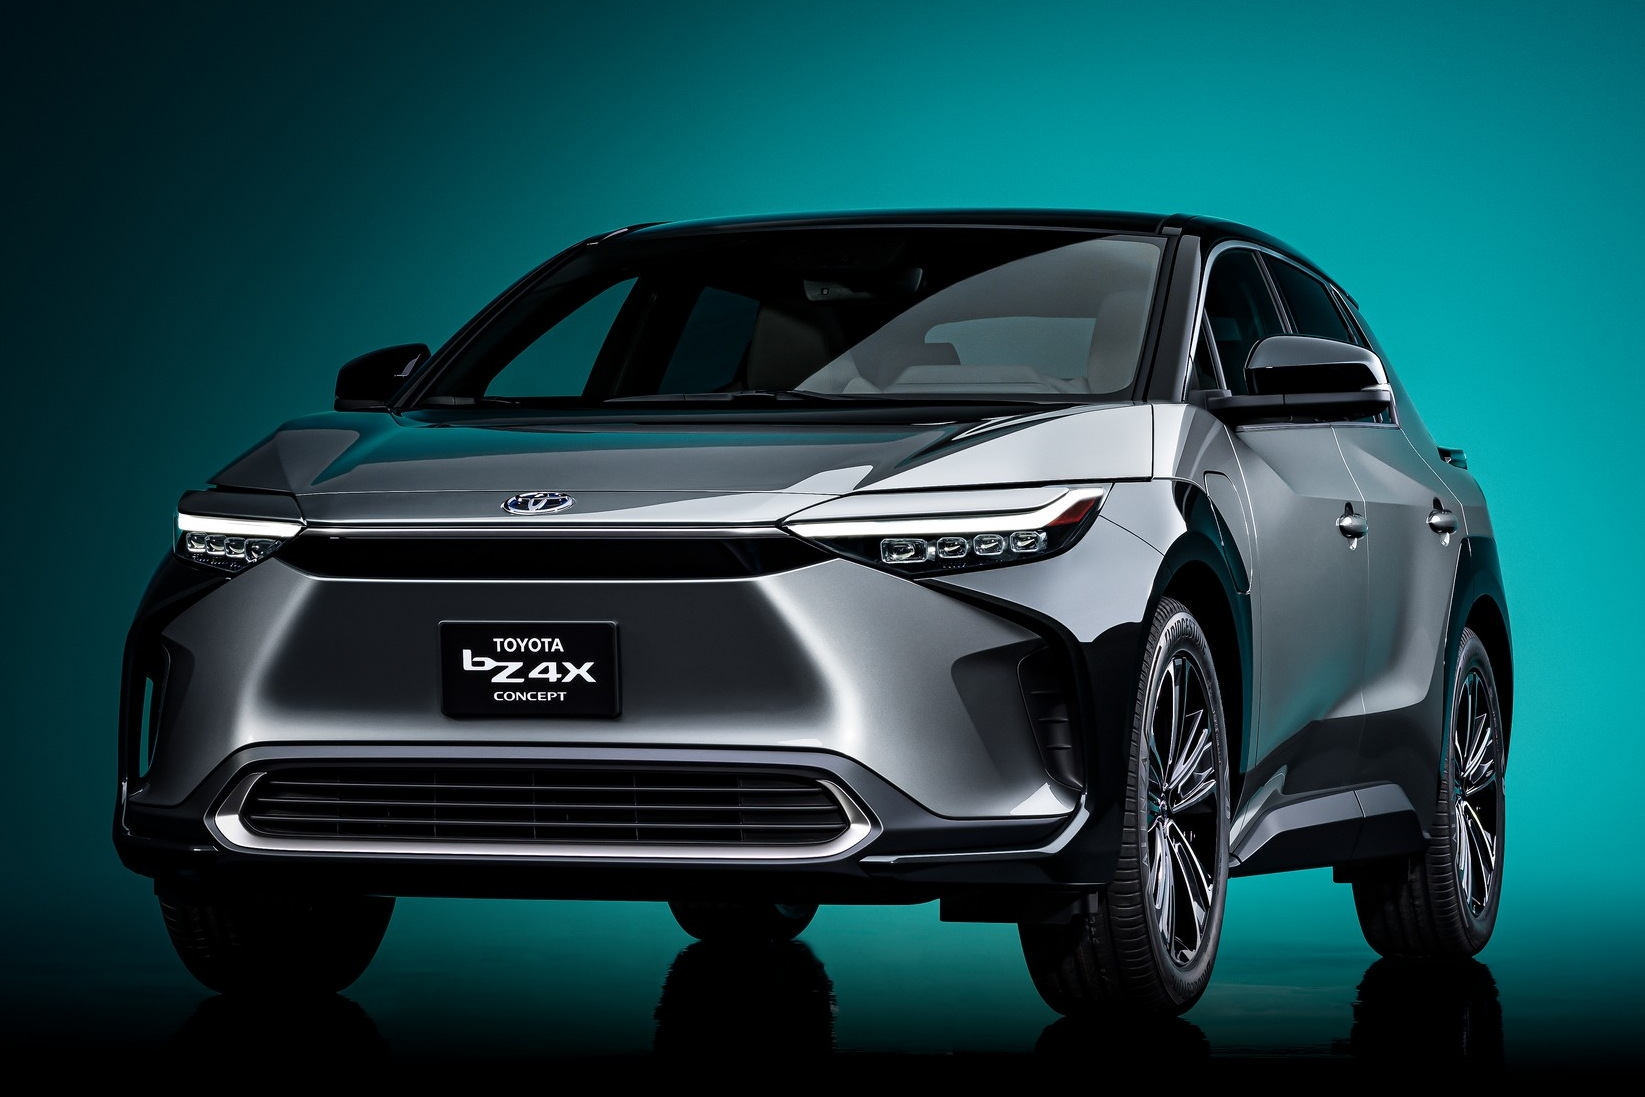 Toyota-bZ4X-Concept-4